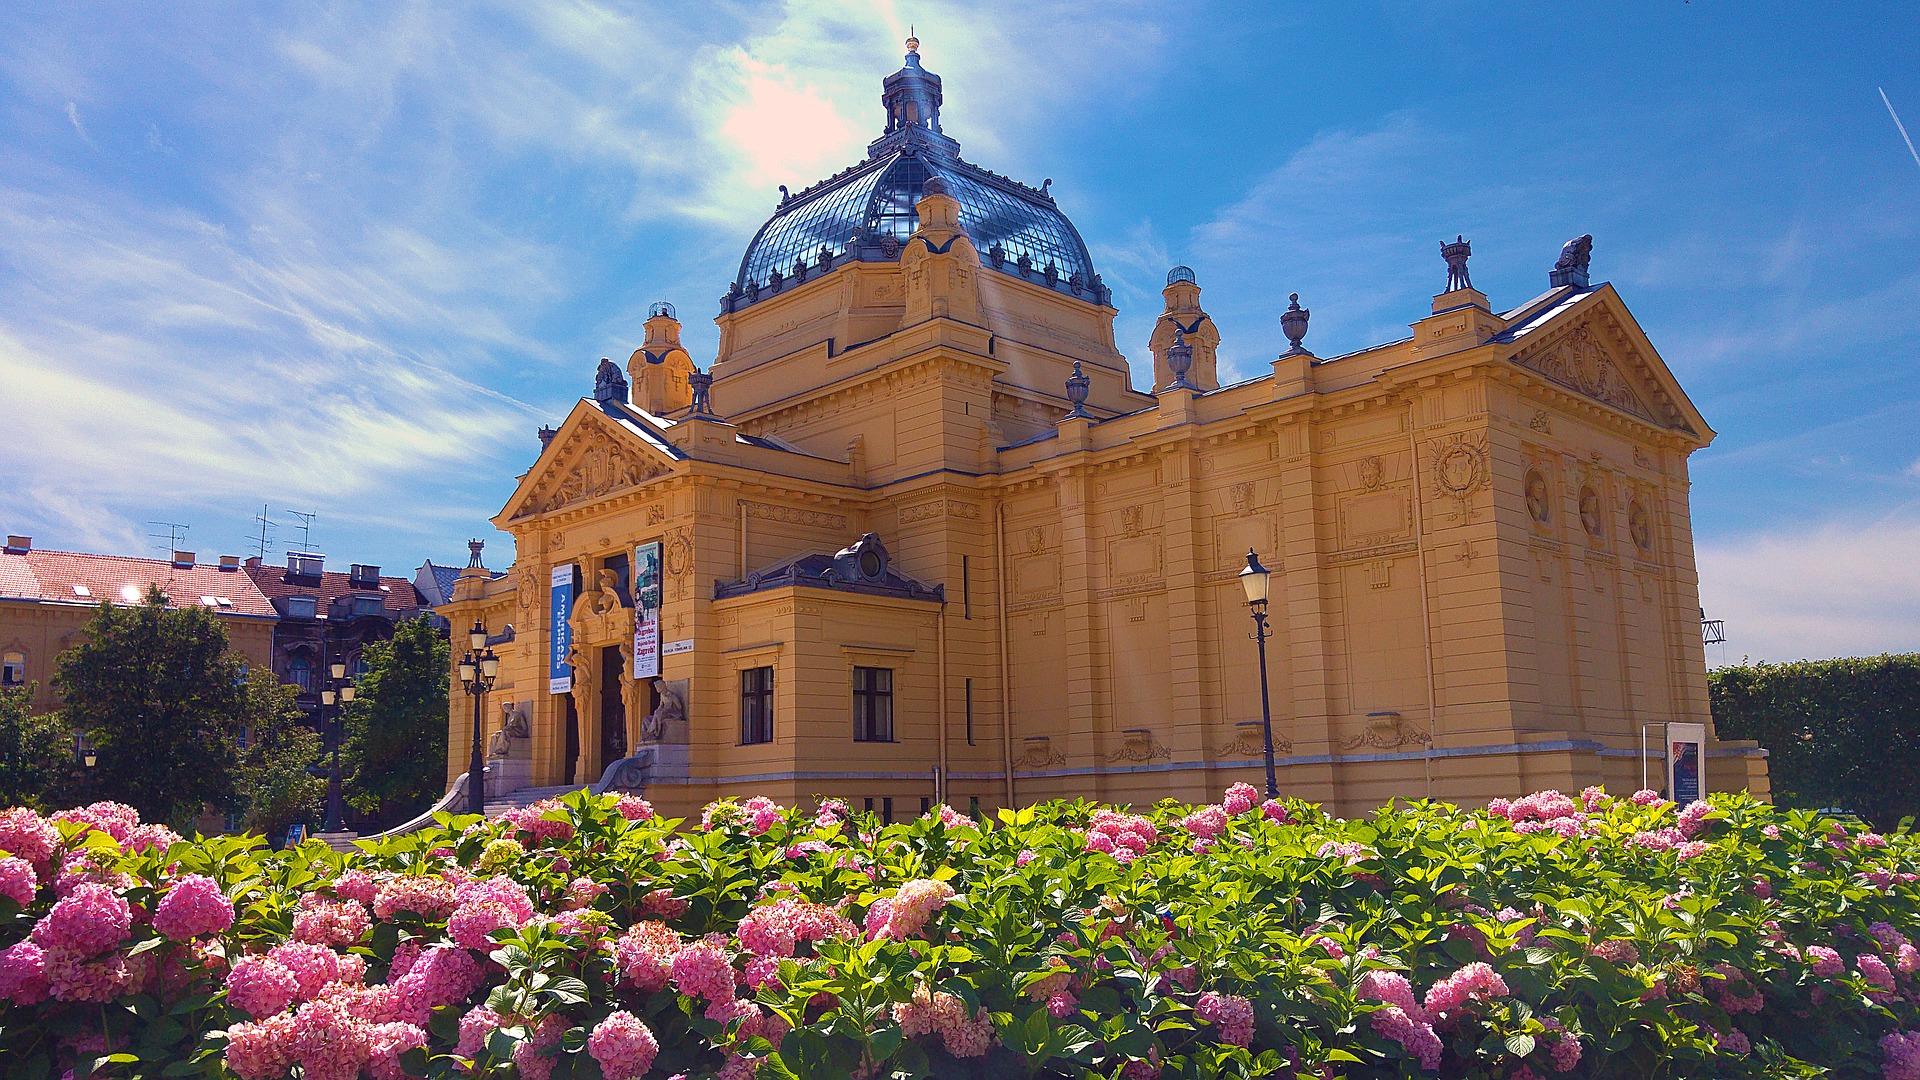 Zagreb_pavillon_des_arts_CC0.jpg?1545742454